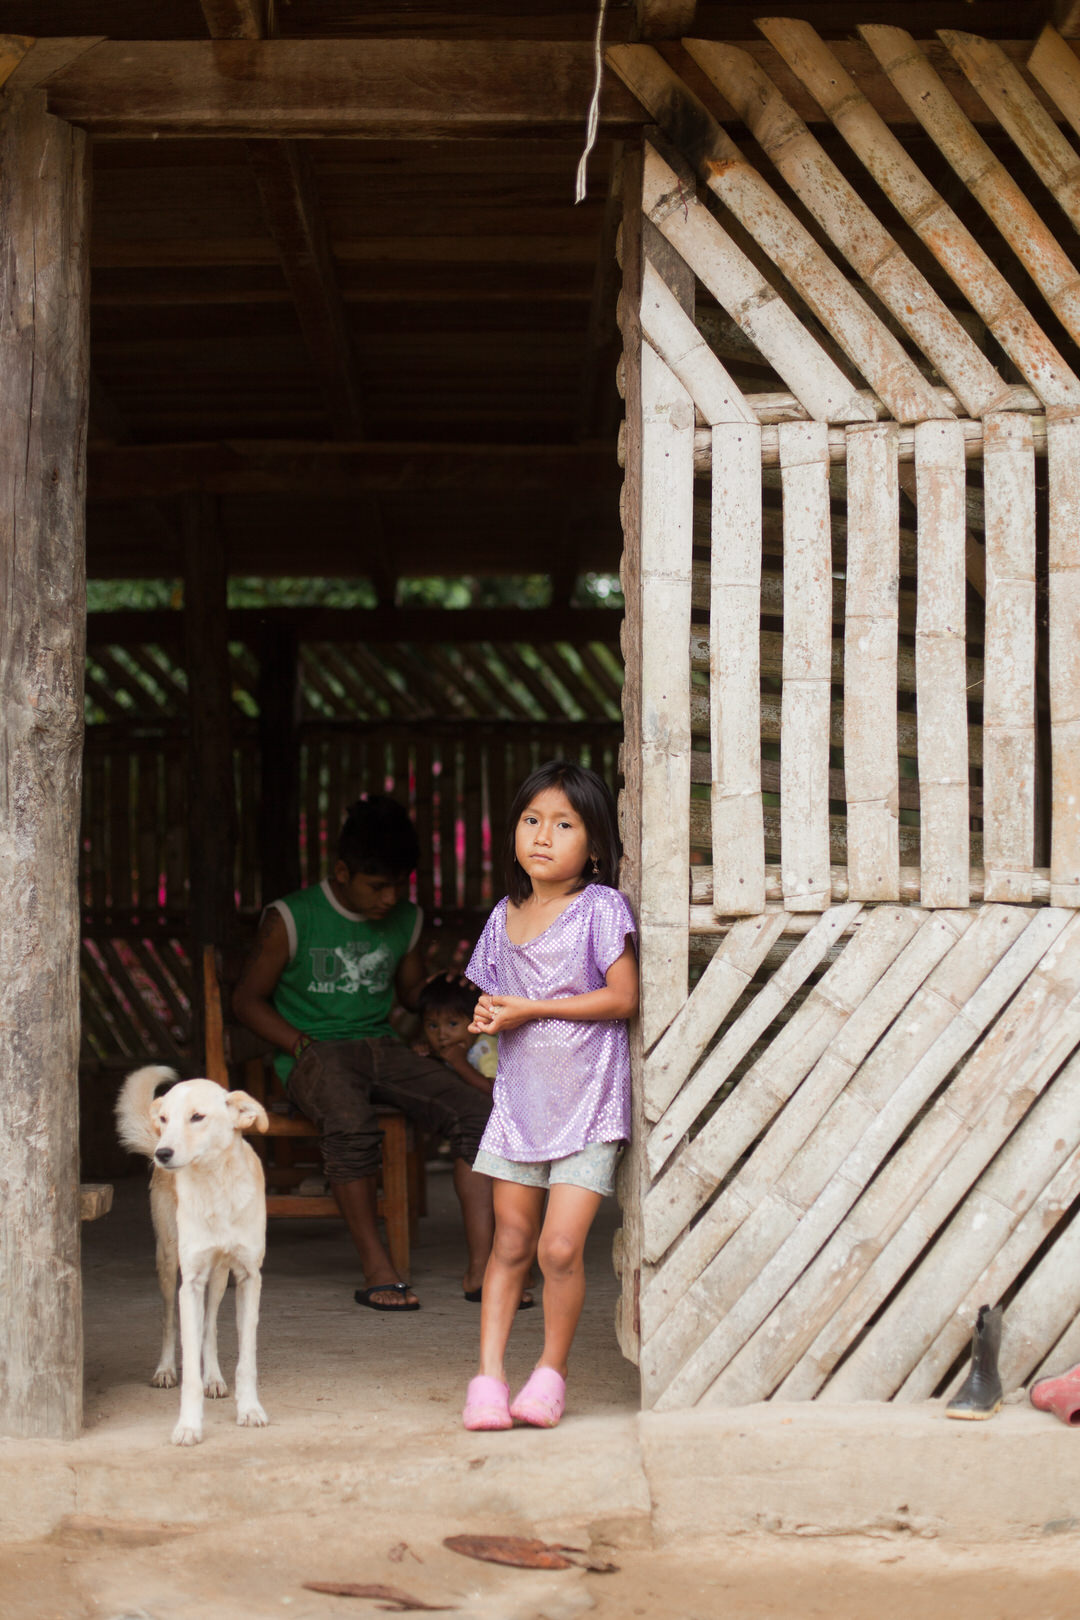 melissa kruse photography - chinimp tuna station, amazon, ecuador-35.jpg